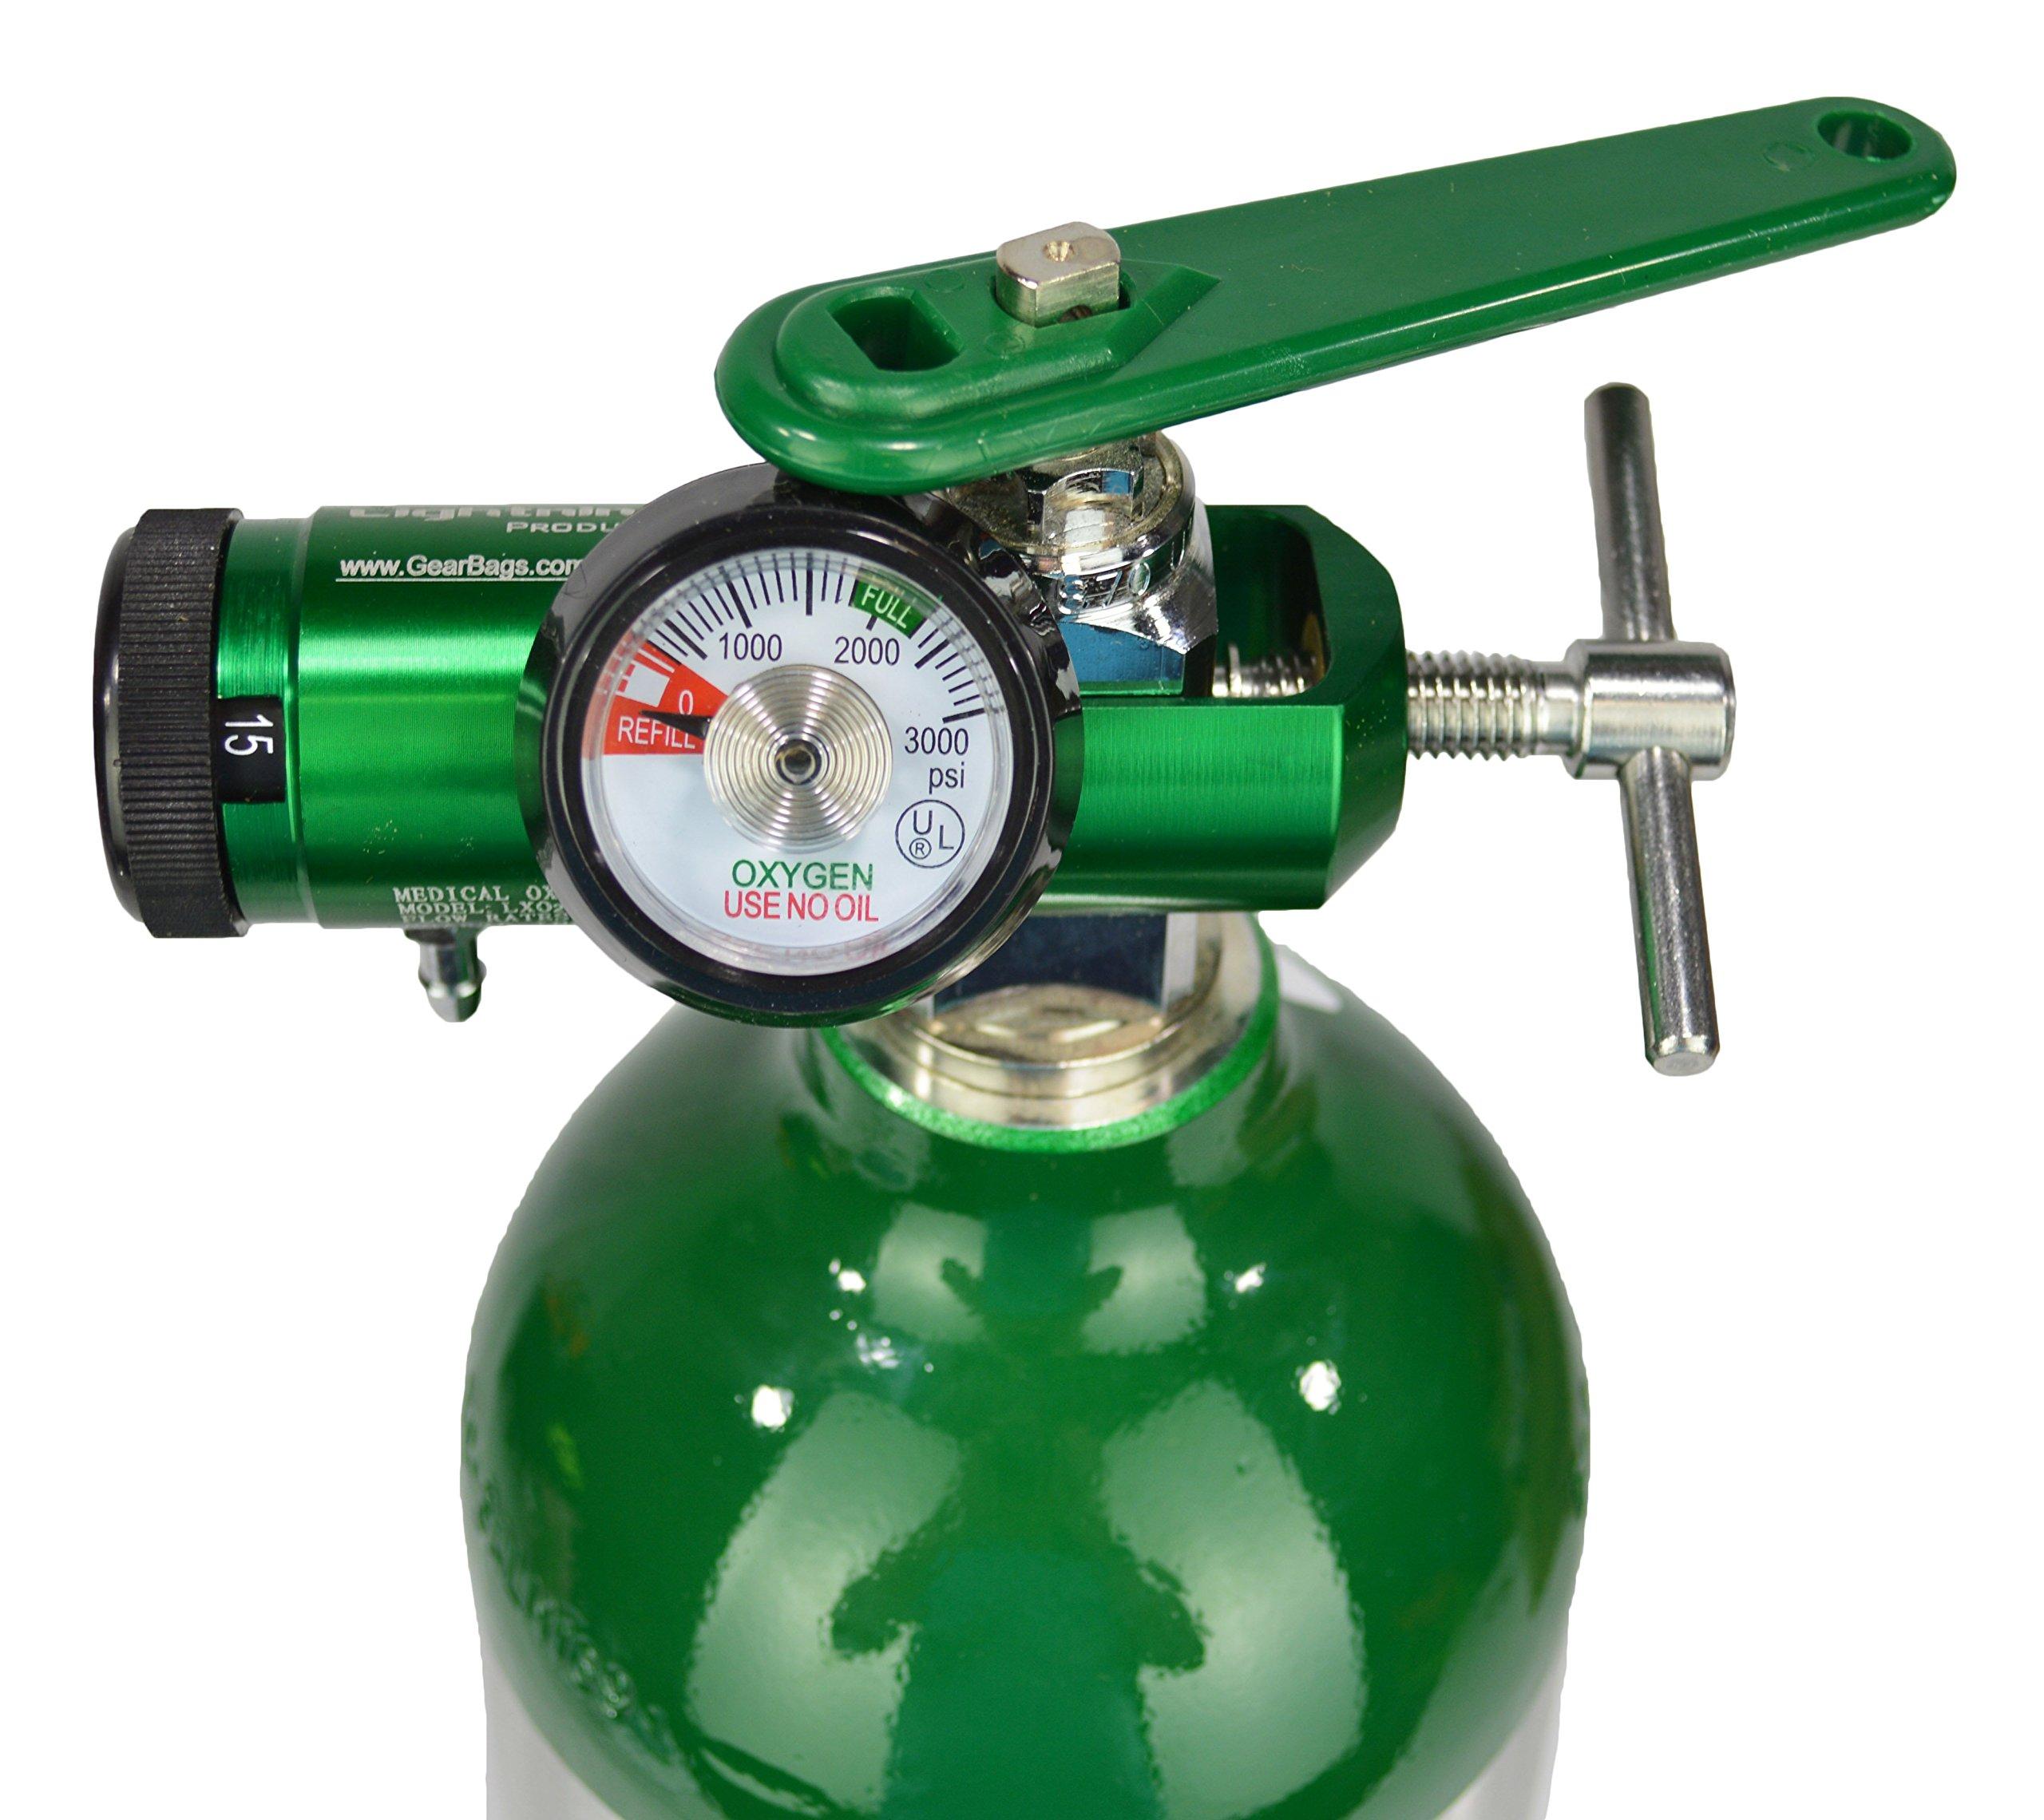 Lightning X O2 Mini Oxygen Regulator CGA-870 Gauge Flow Rate 0-15lpm w/Wrench